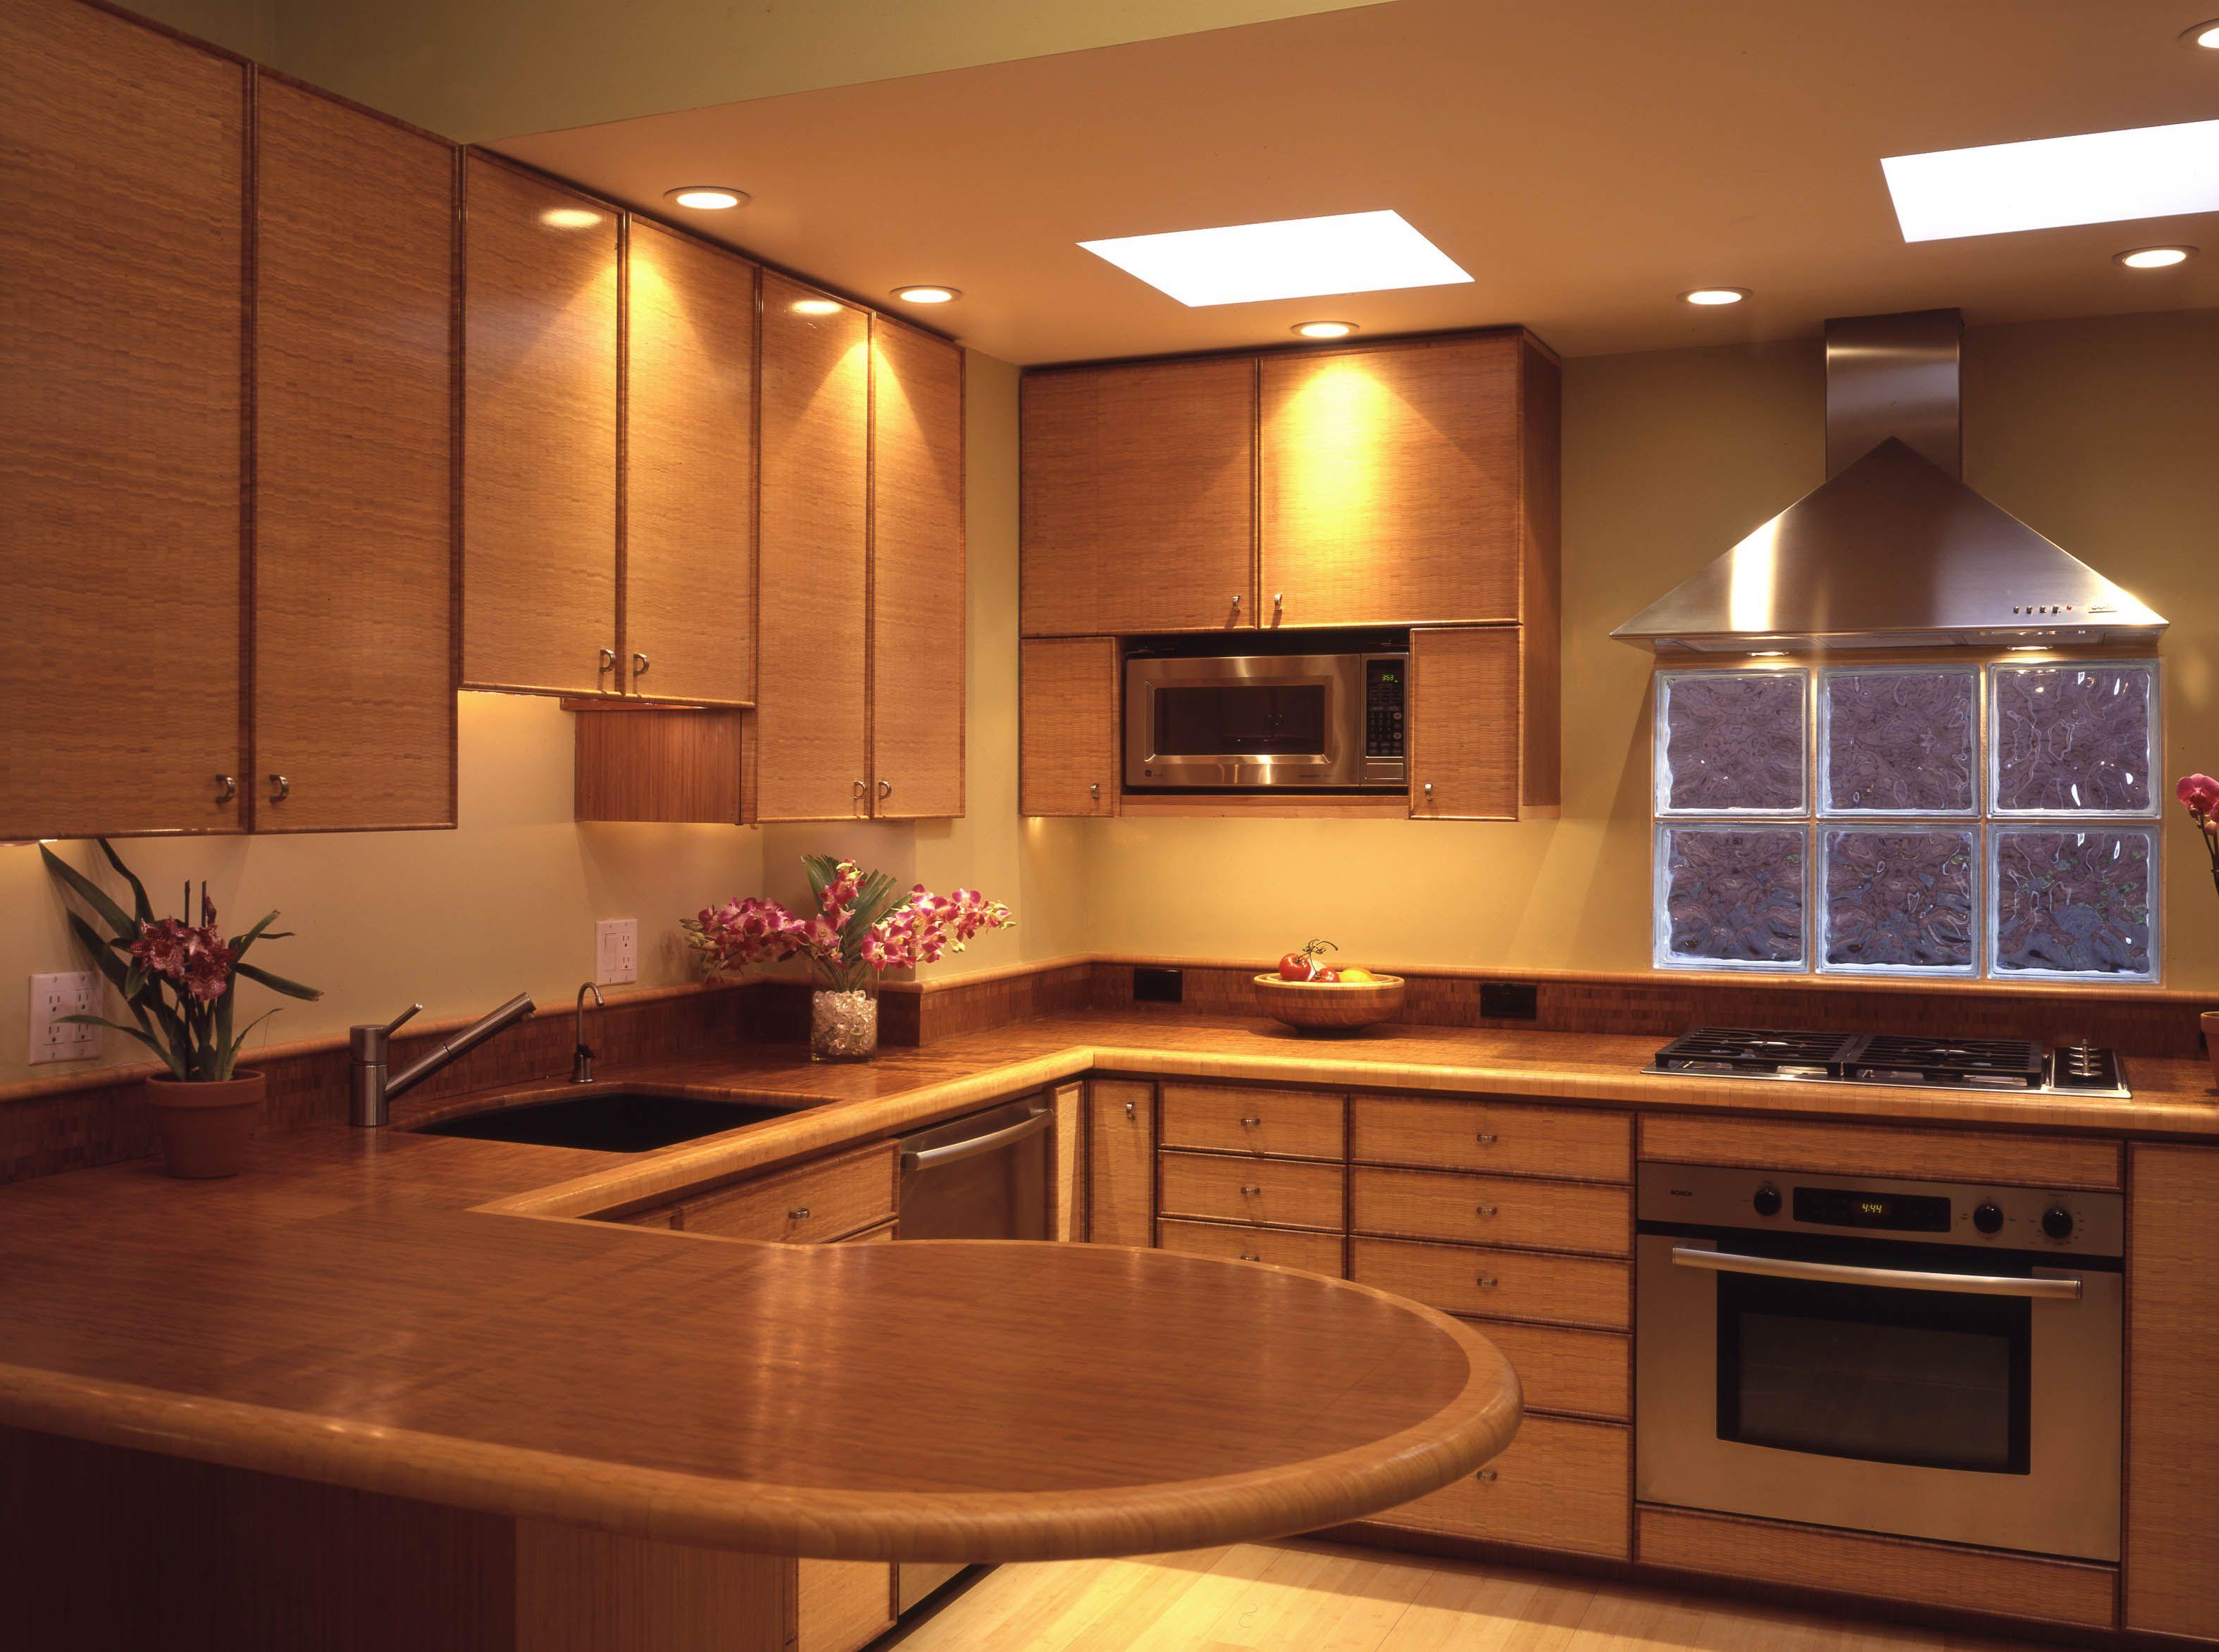 Kitchen Cabinets Bamboo Kitchen Cabinets Ttdy Org Kitchen Cabinets Beautiful Kitchens Kitchen Themes